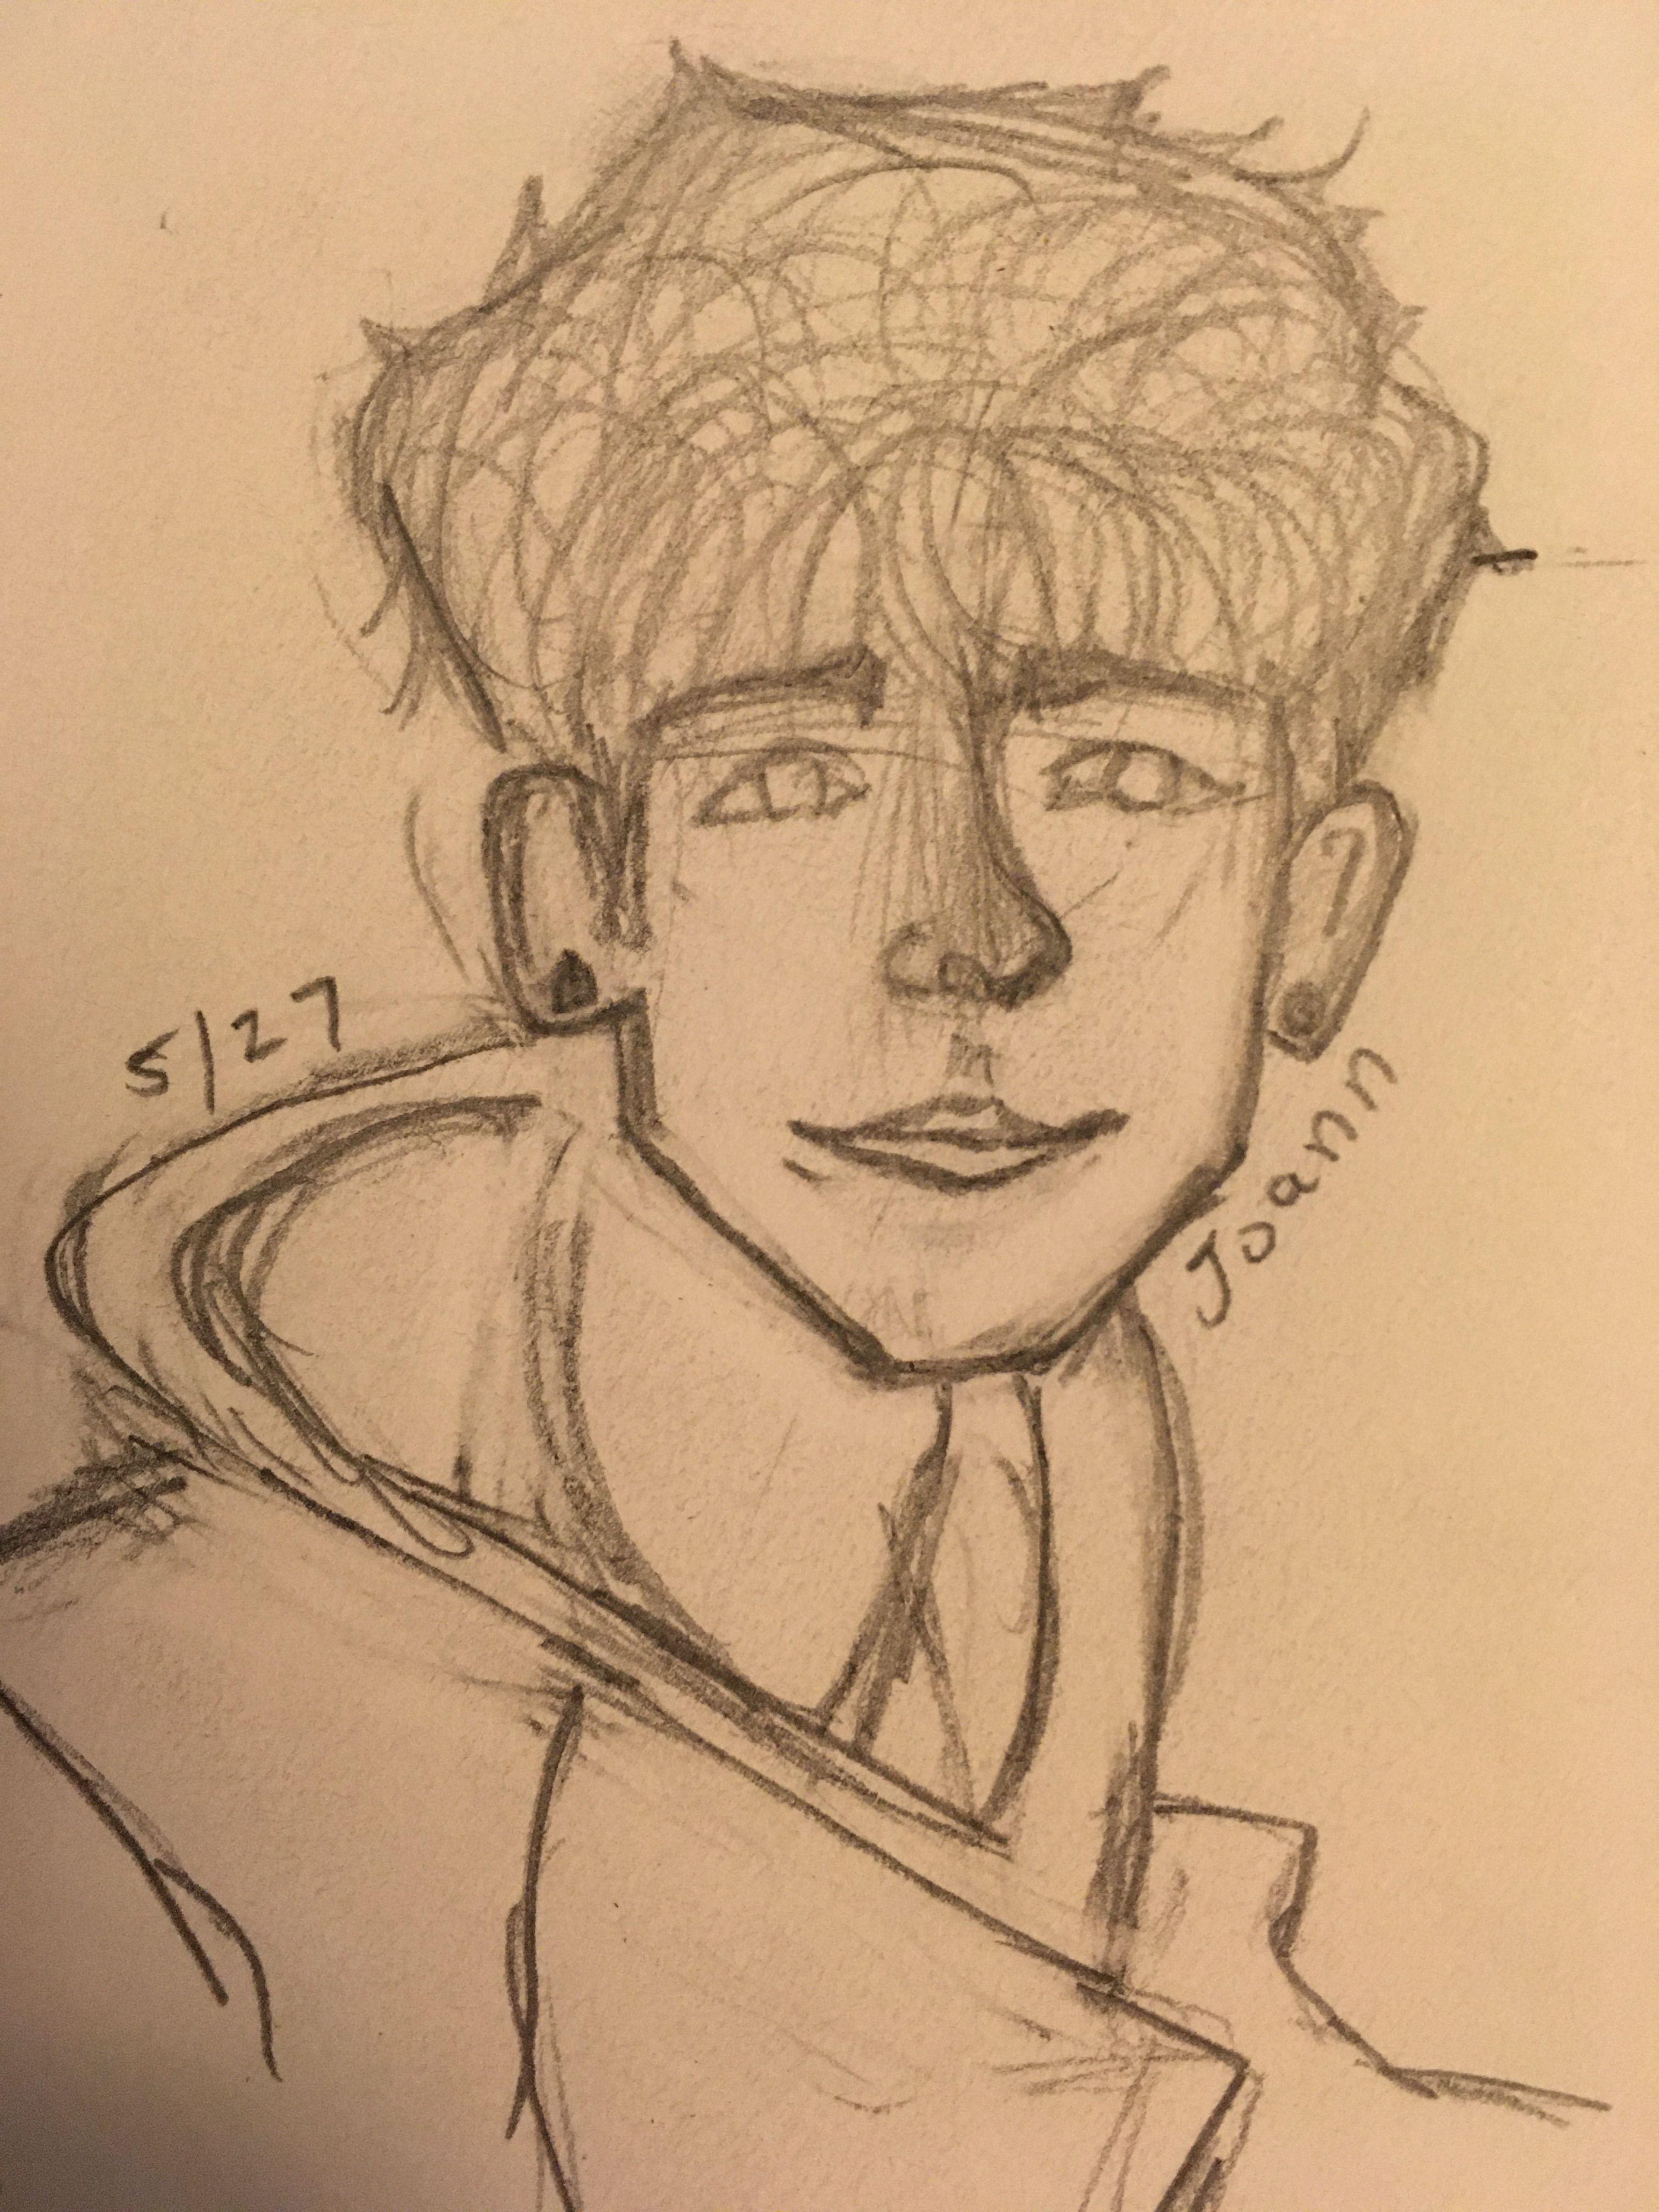 #cute #drawing #sketch #pencil #quick #boys #hoodie #pencilart